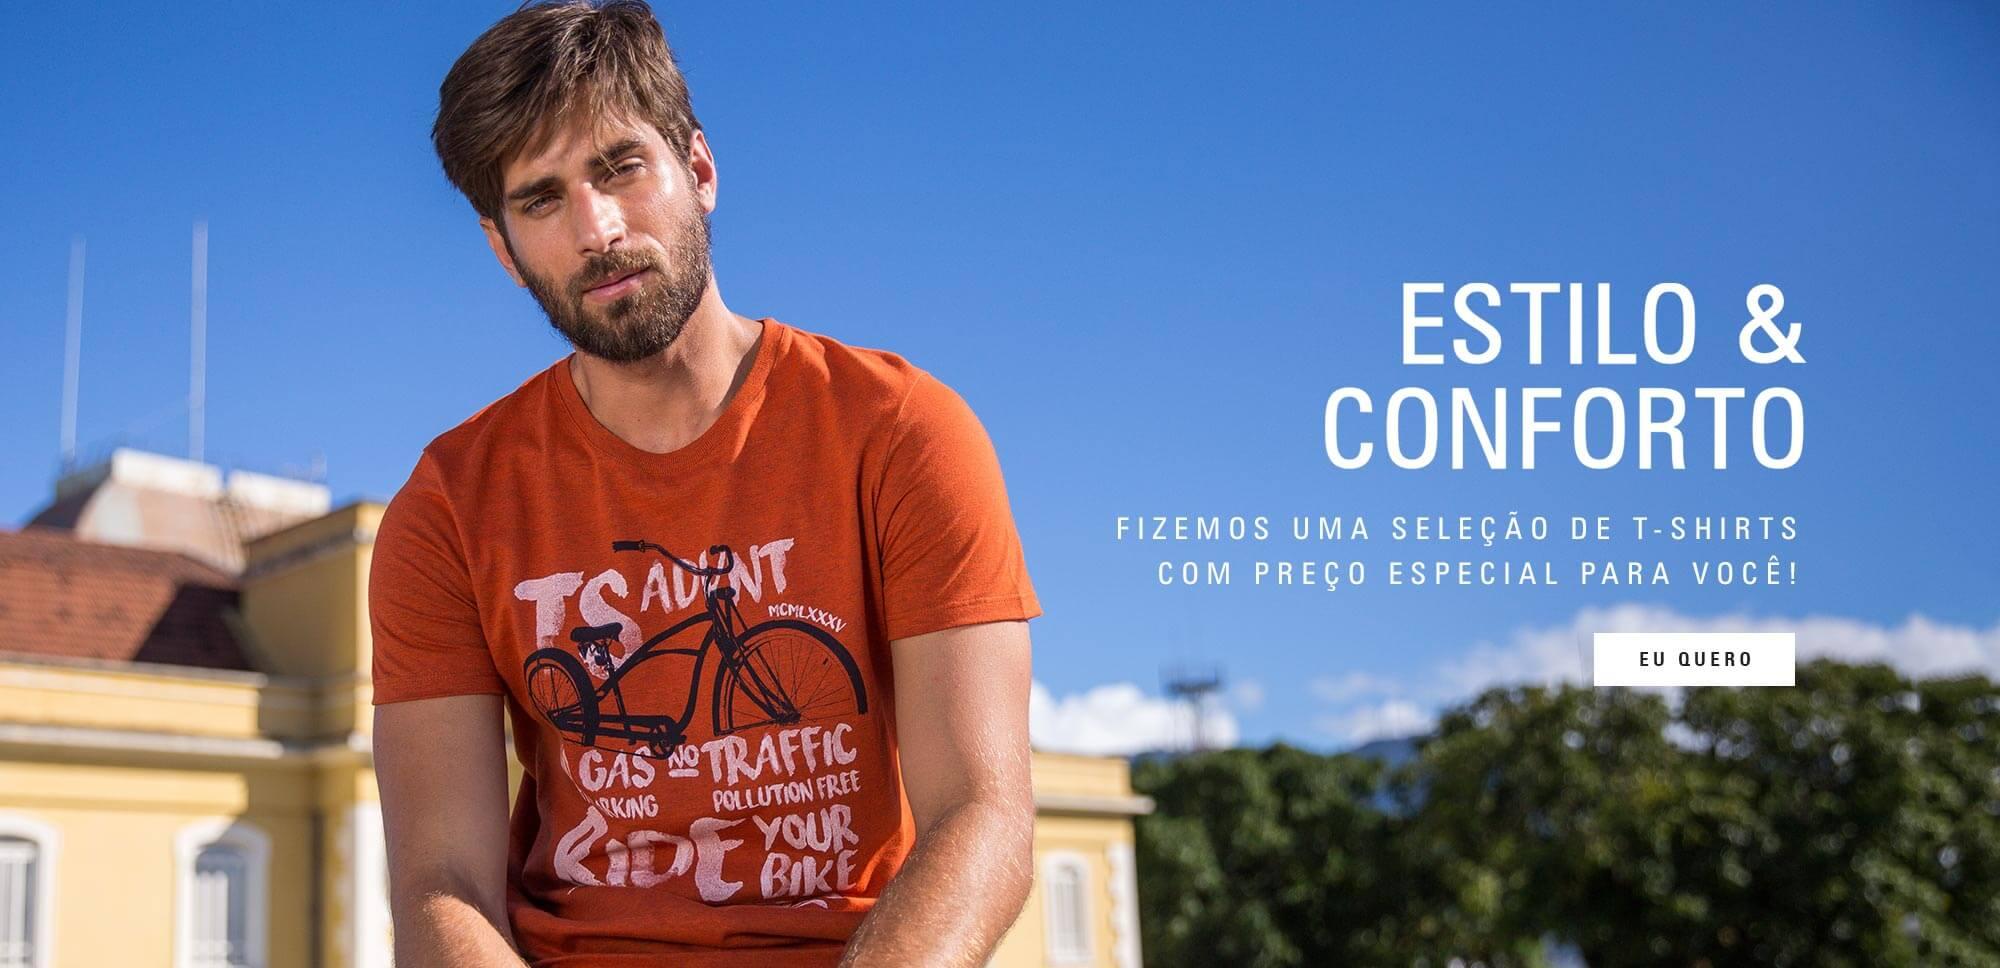 Estilo & Conforto - T-Shirts